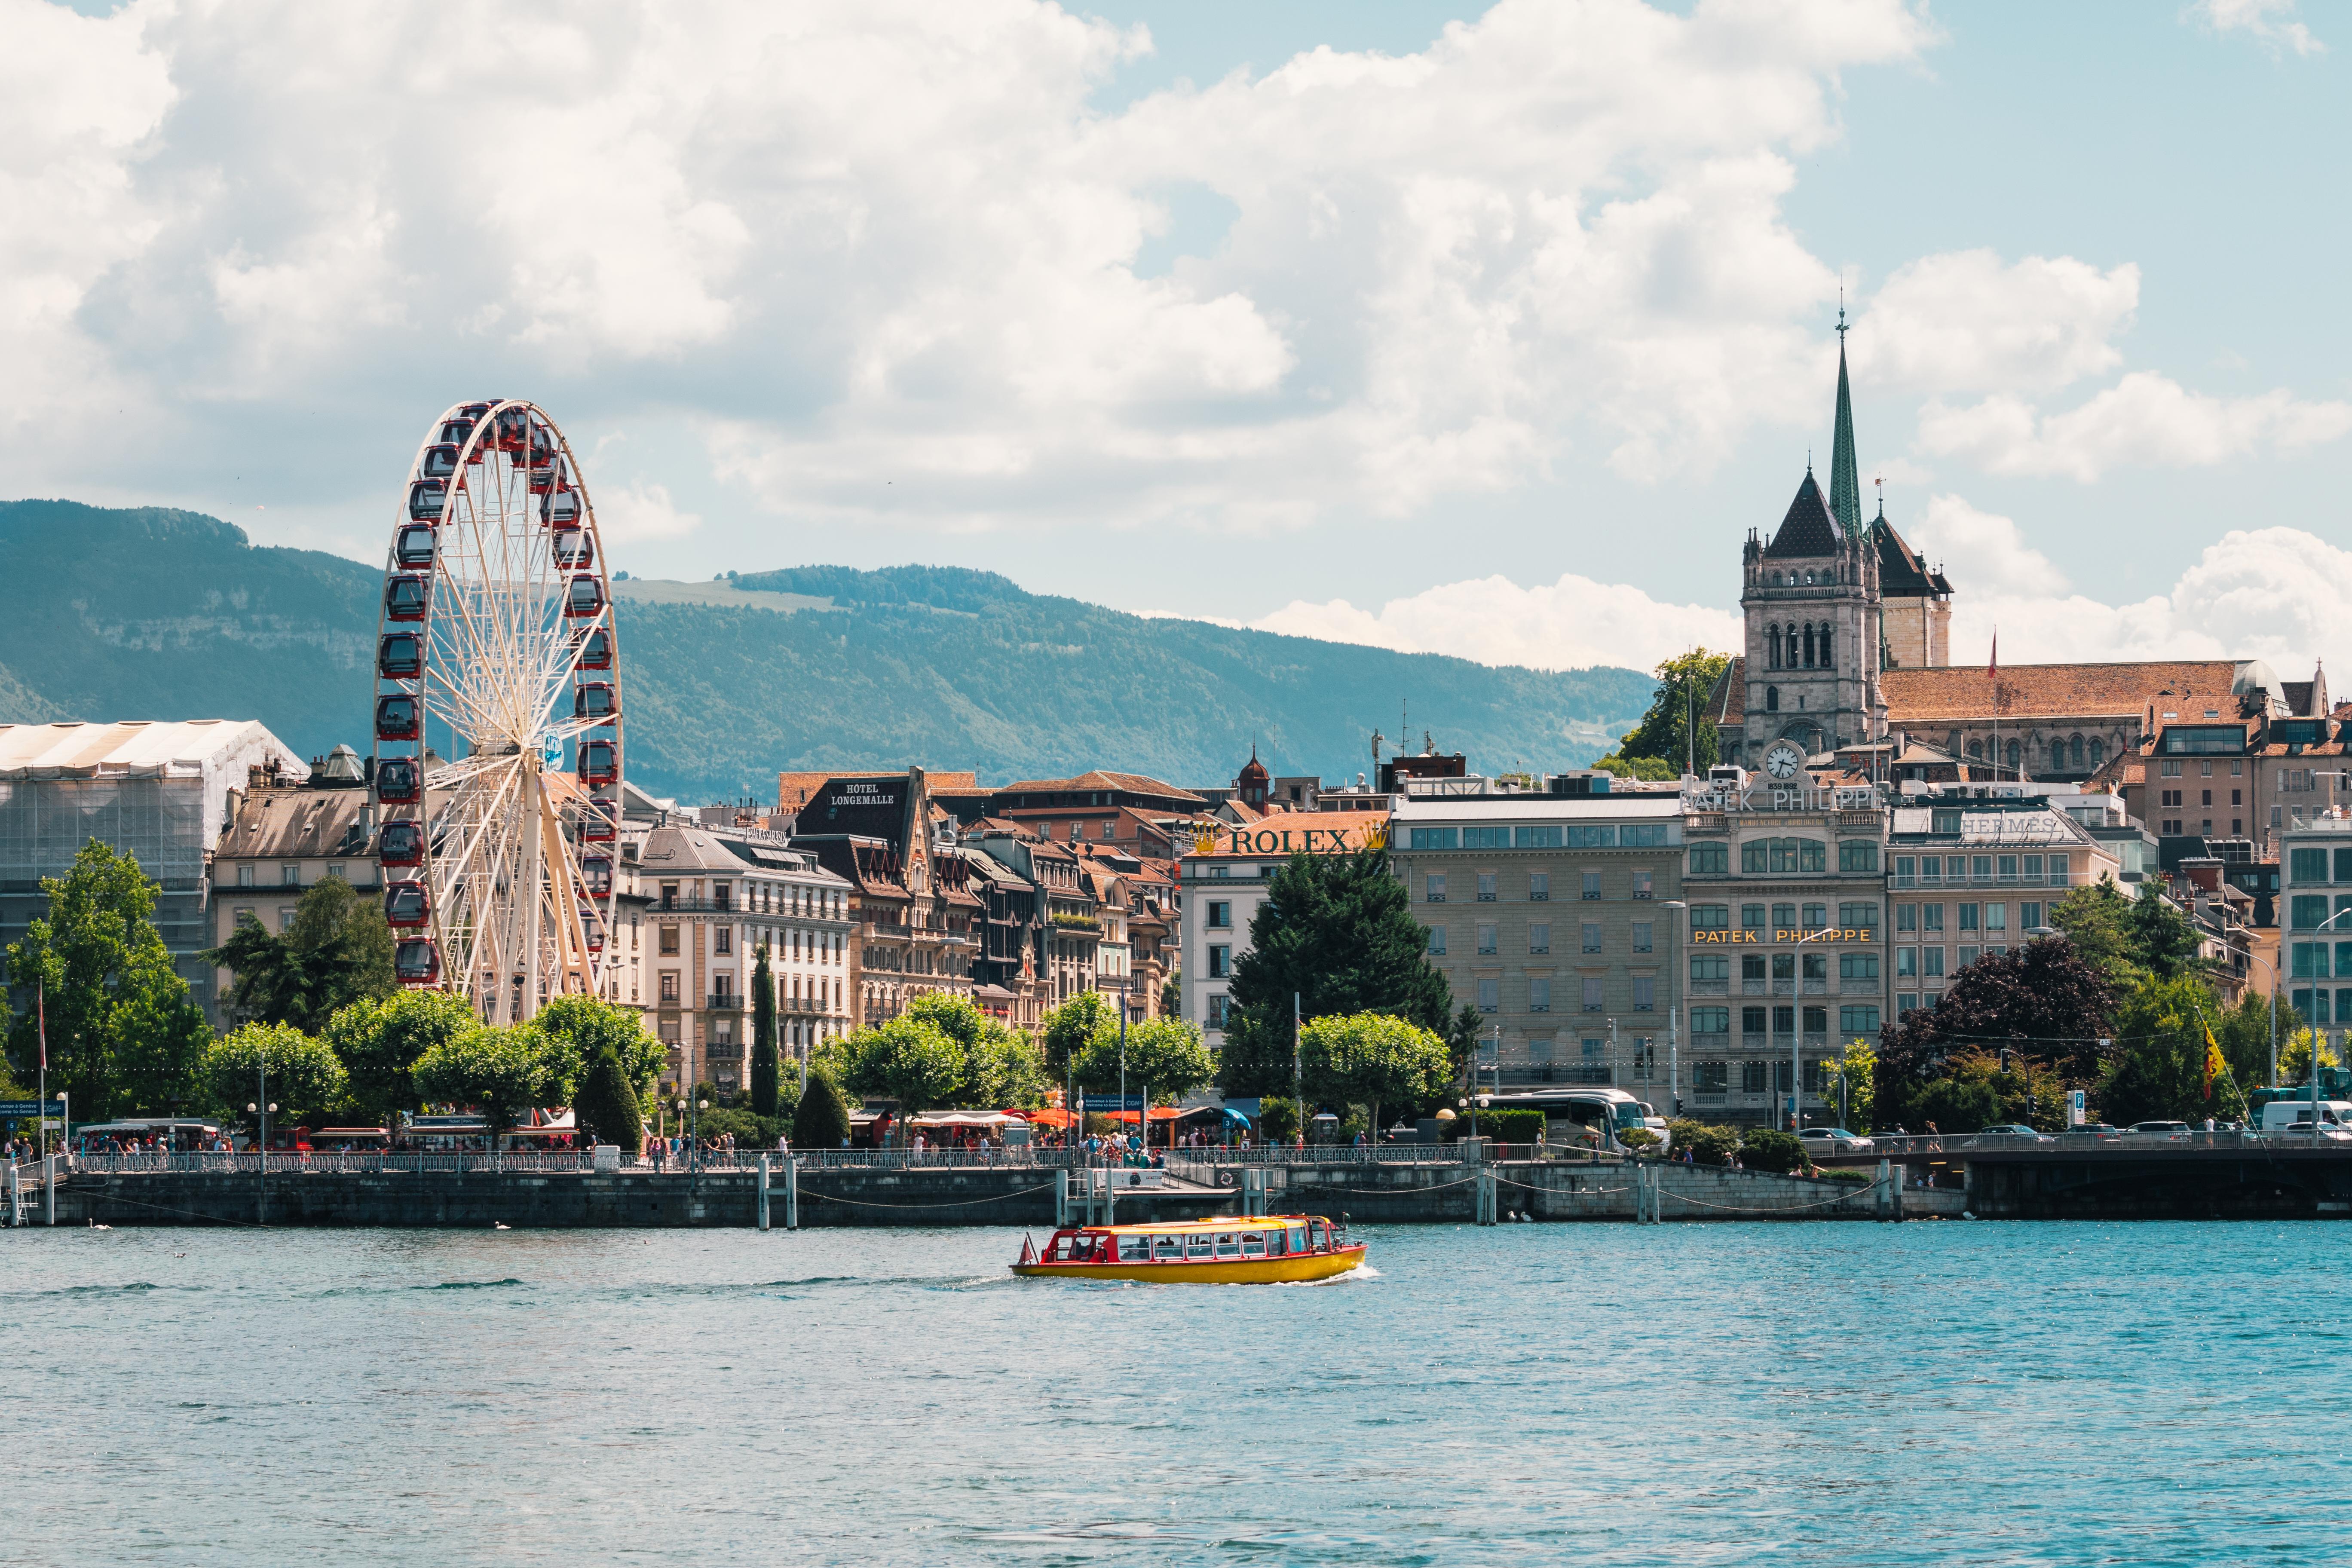 Fêtes de Genève - Rade